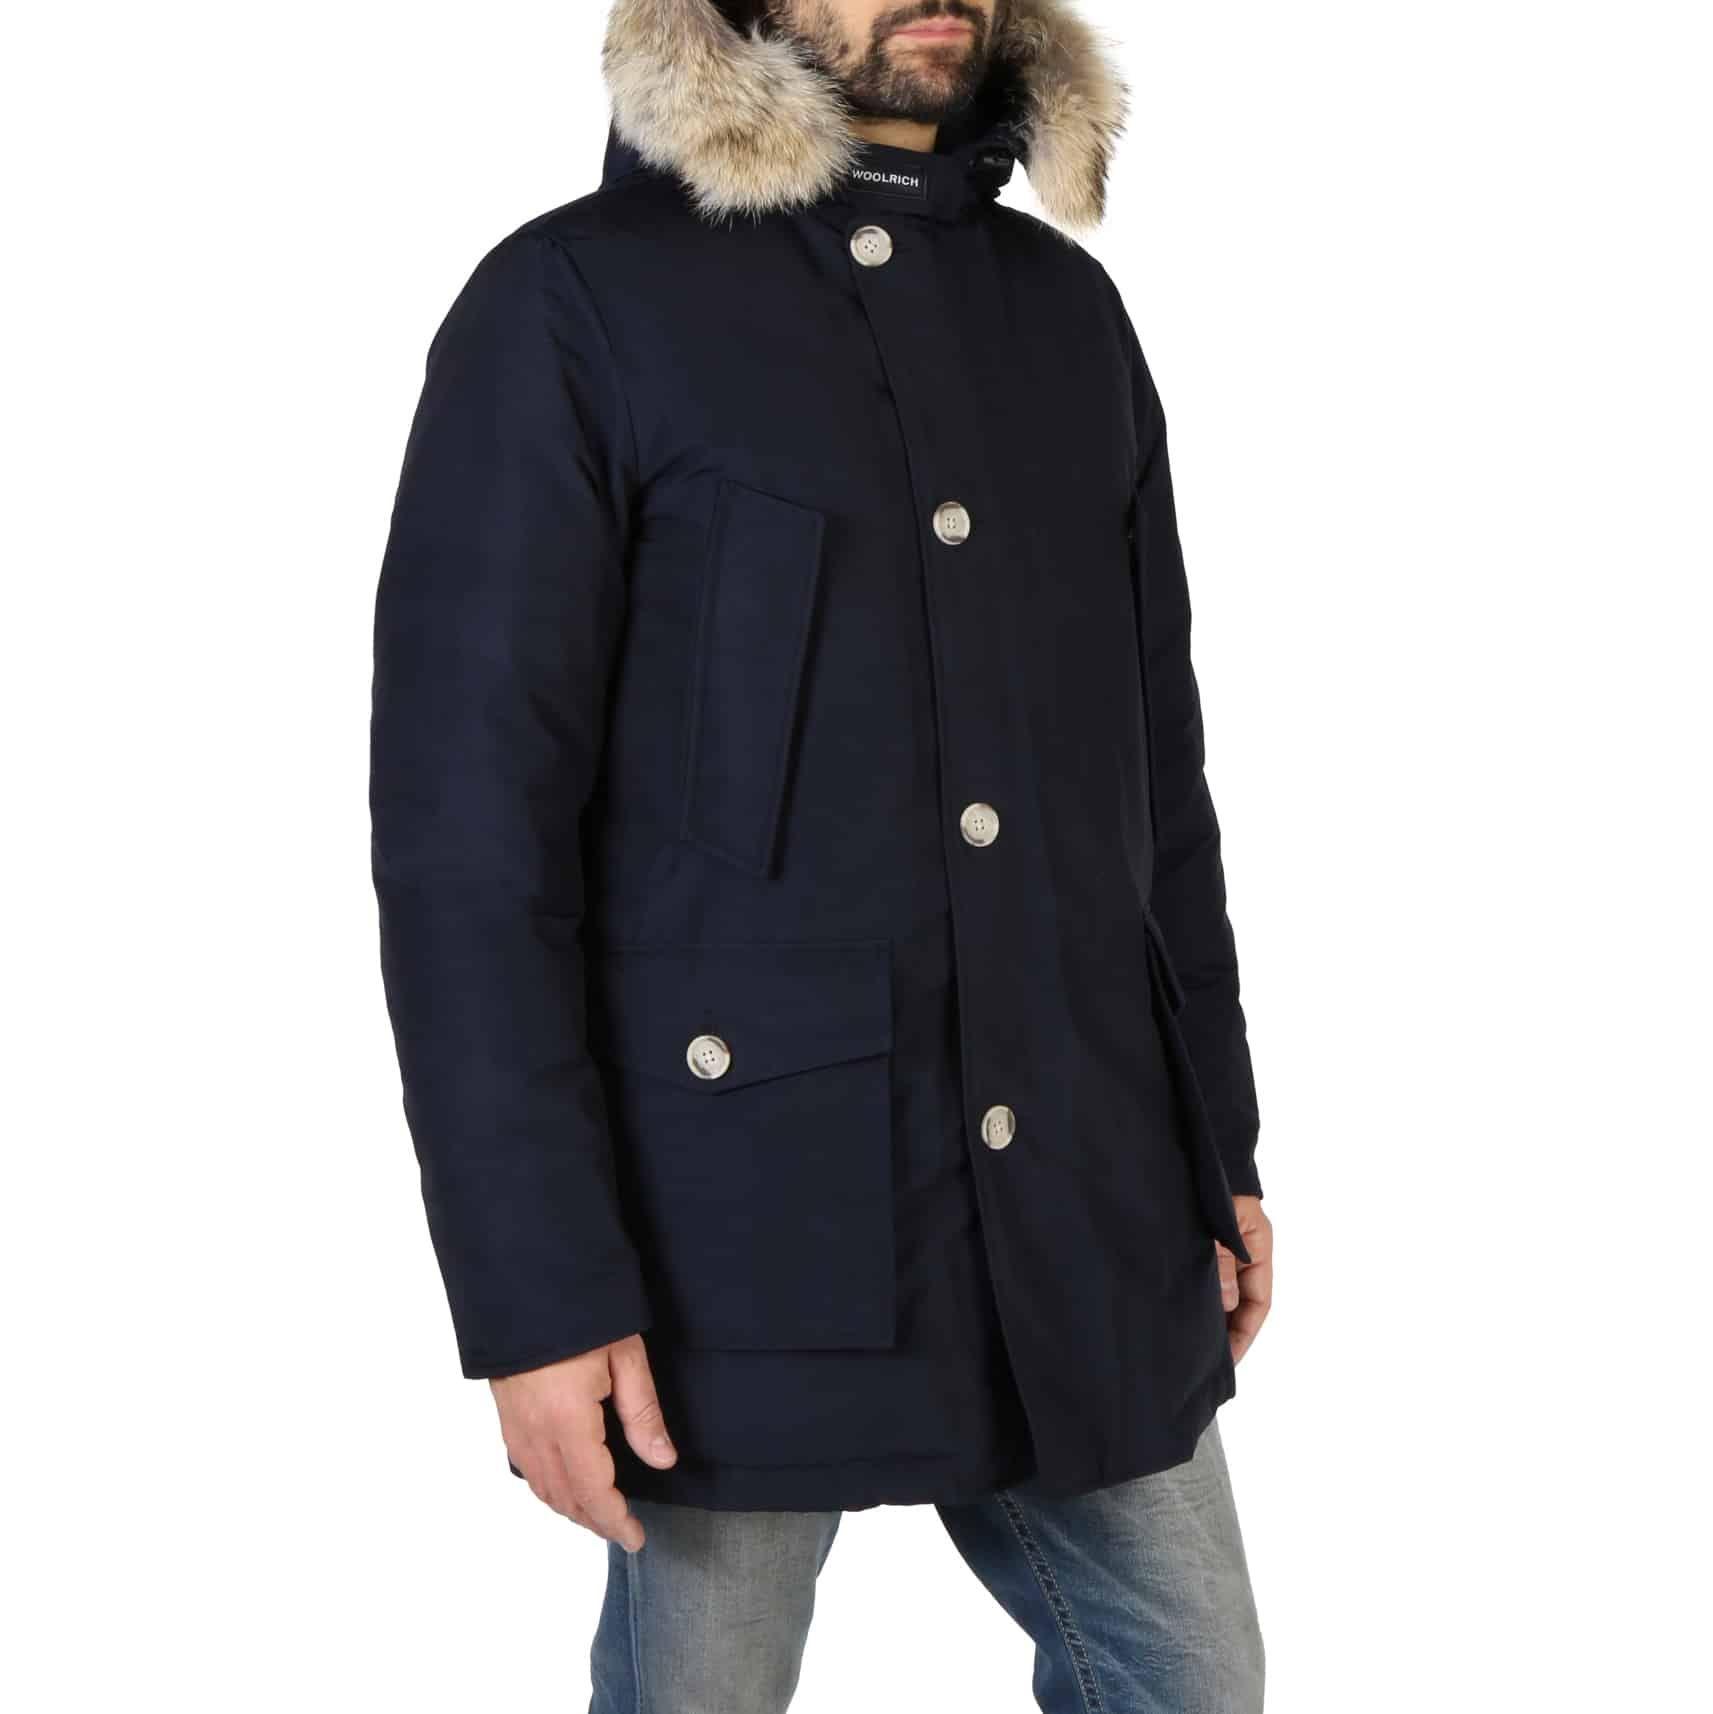 Bekleidung Woolrich – WOCPS2880